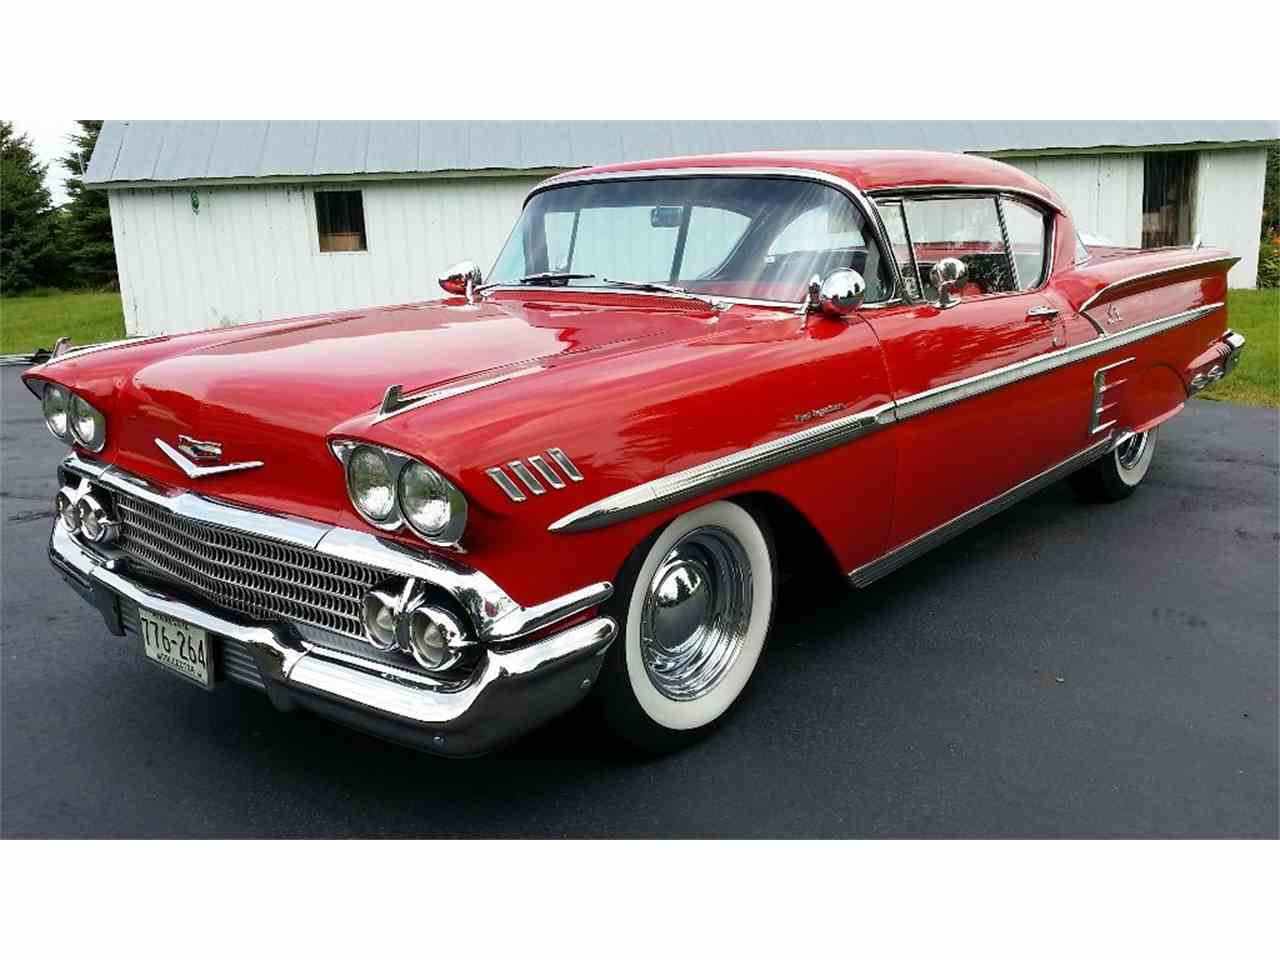 1958 chevrolet impala for sale cc 993030. Black Bedroom Furniture Sets. Home Design Ideas